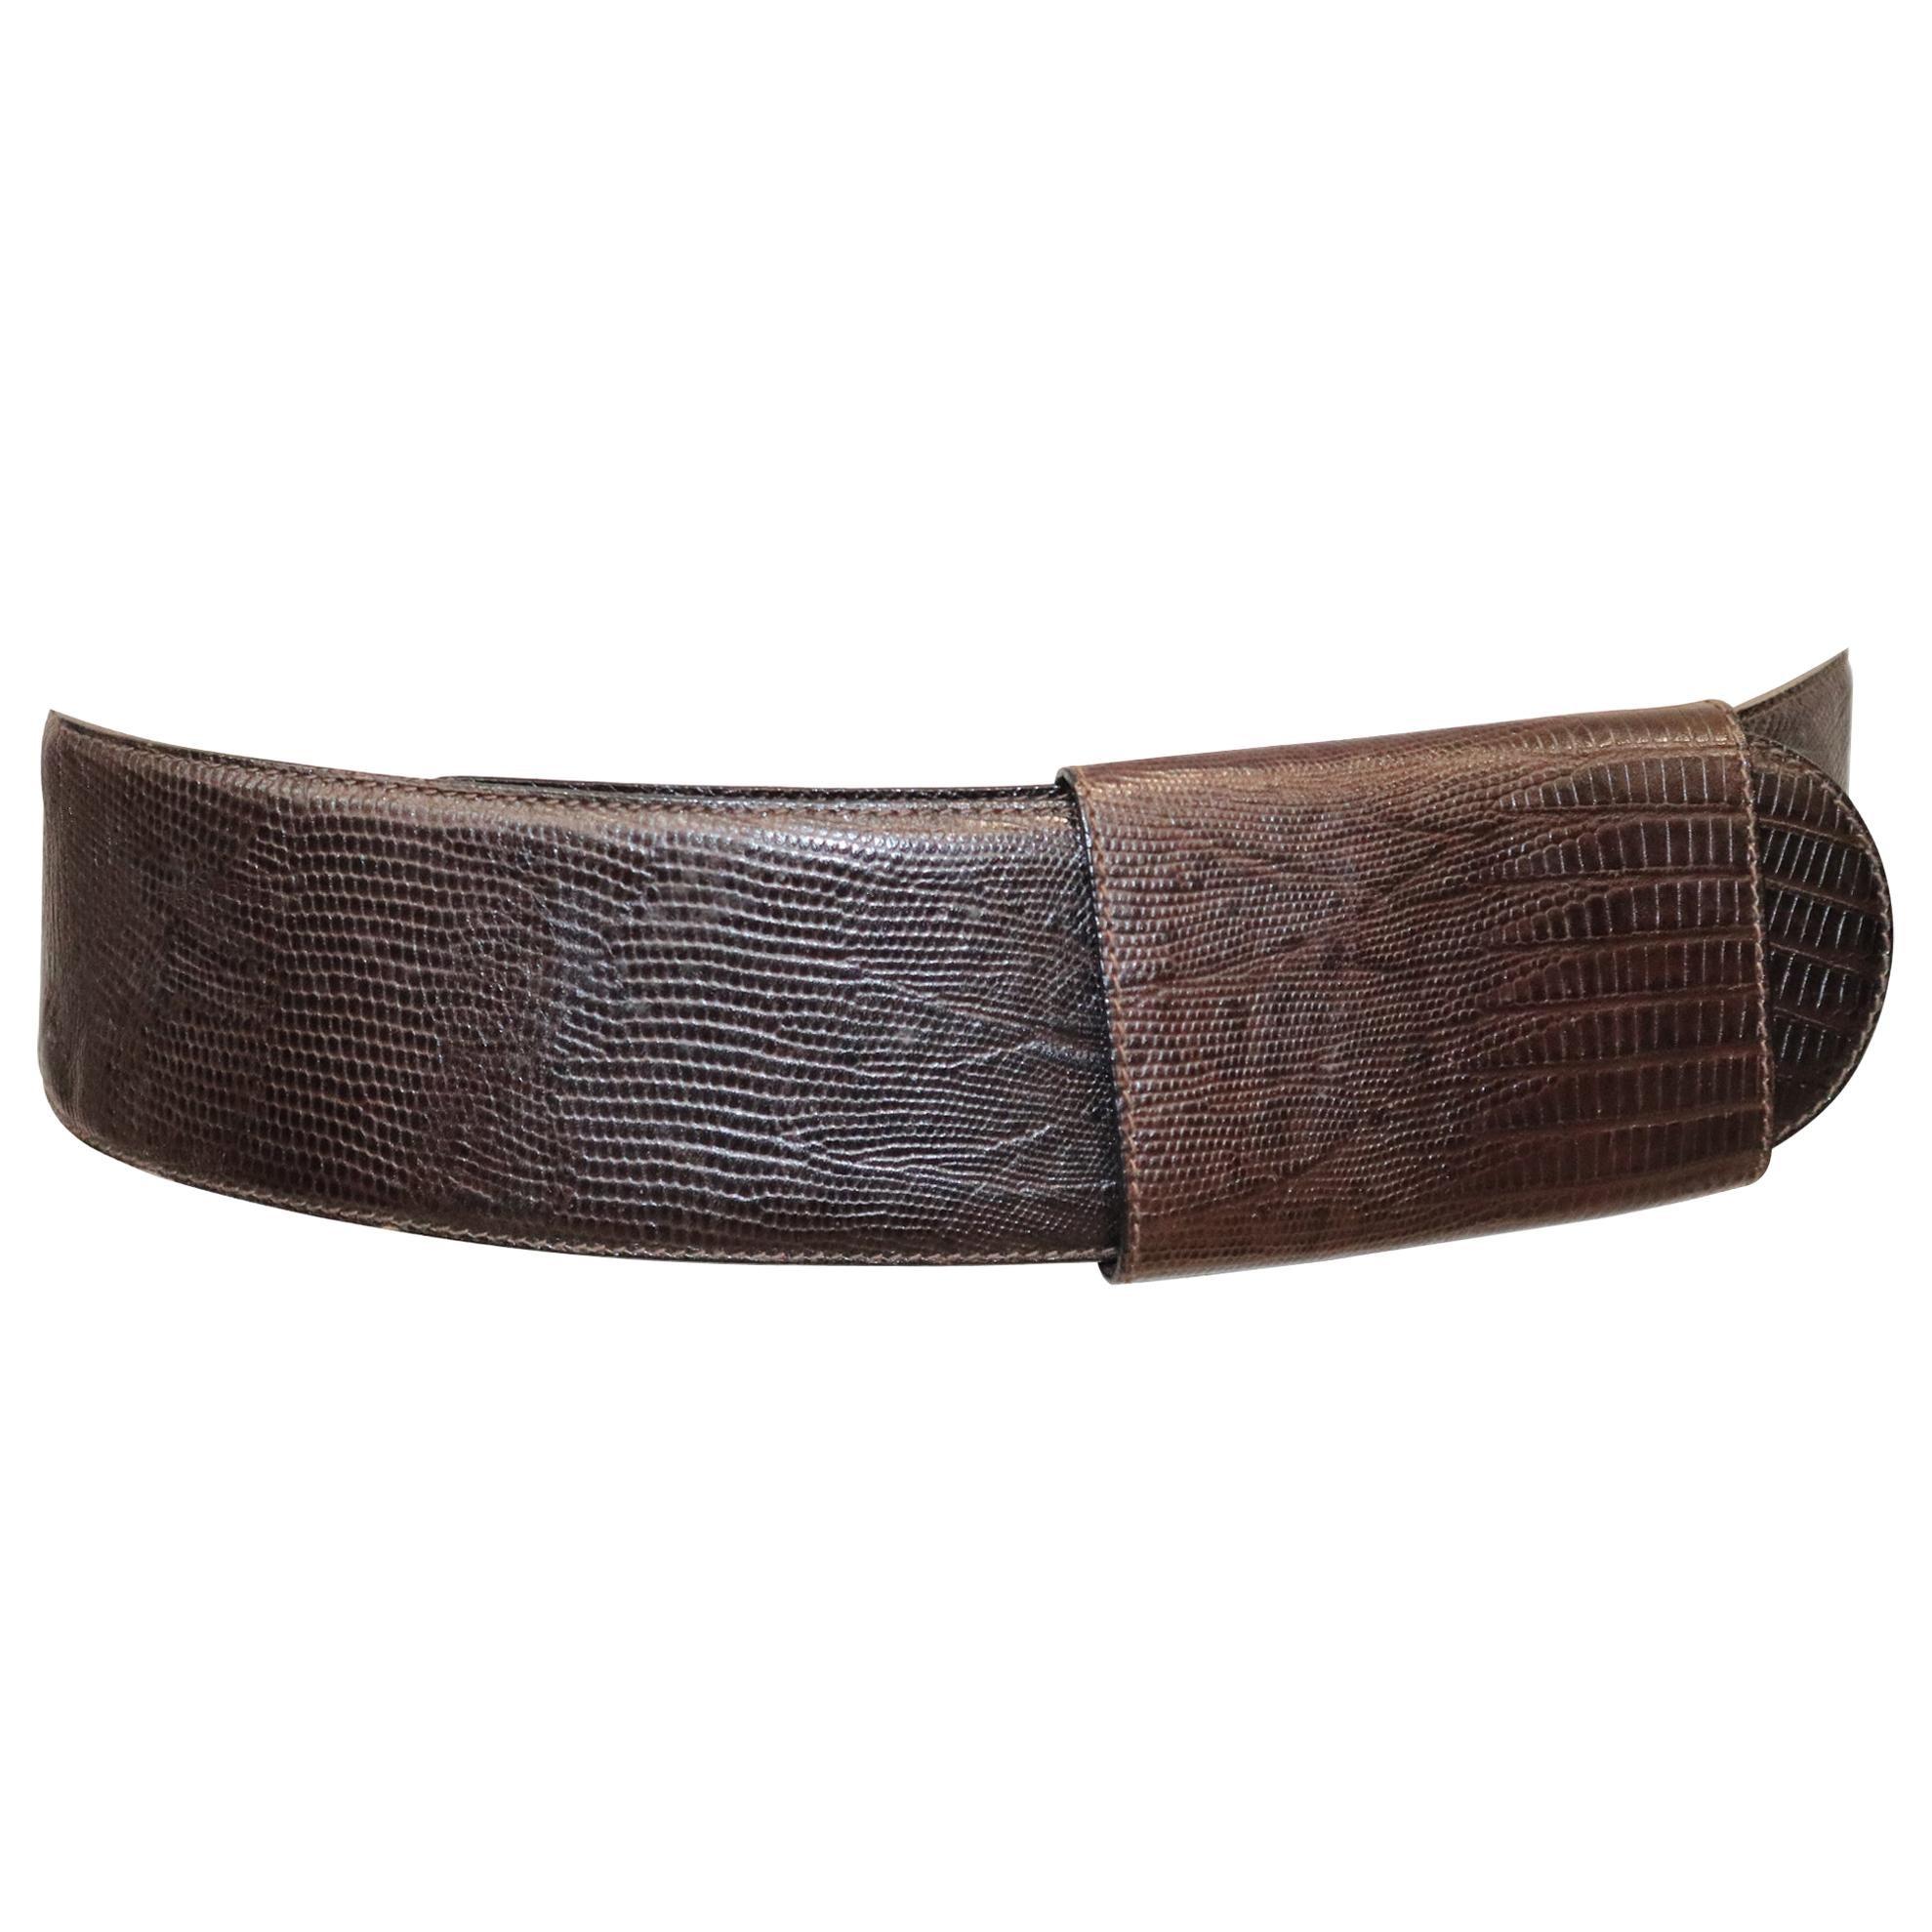 Donna Karan Brown Faux Lizard Leather Belt